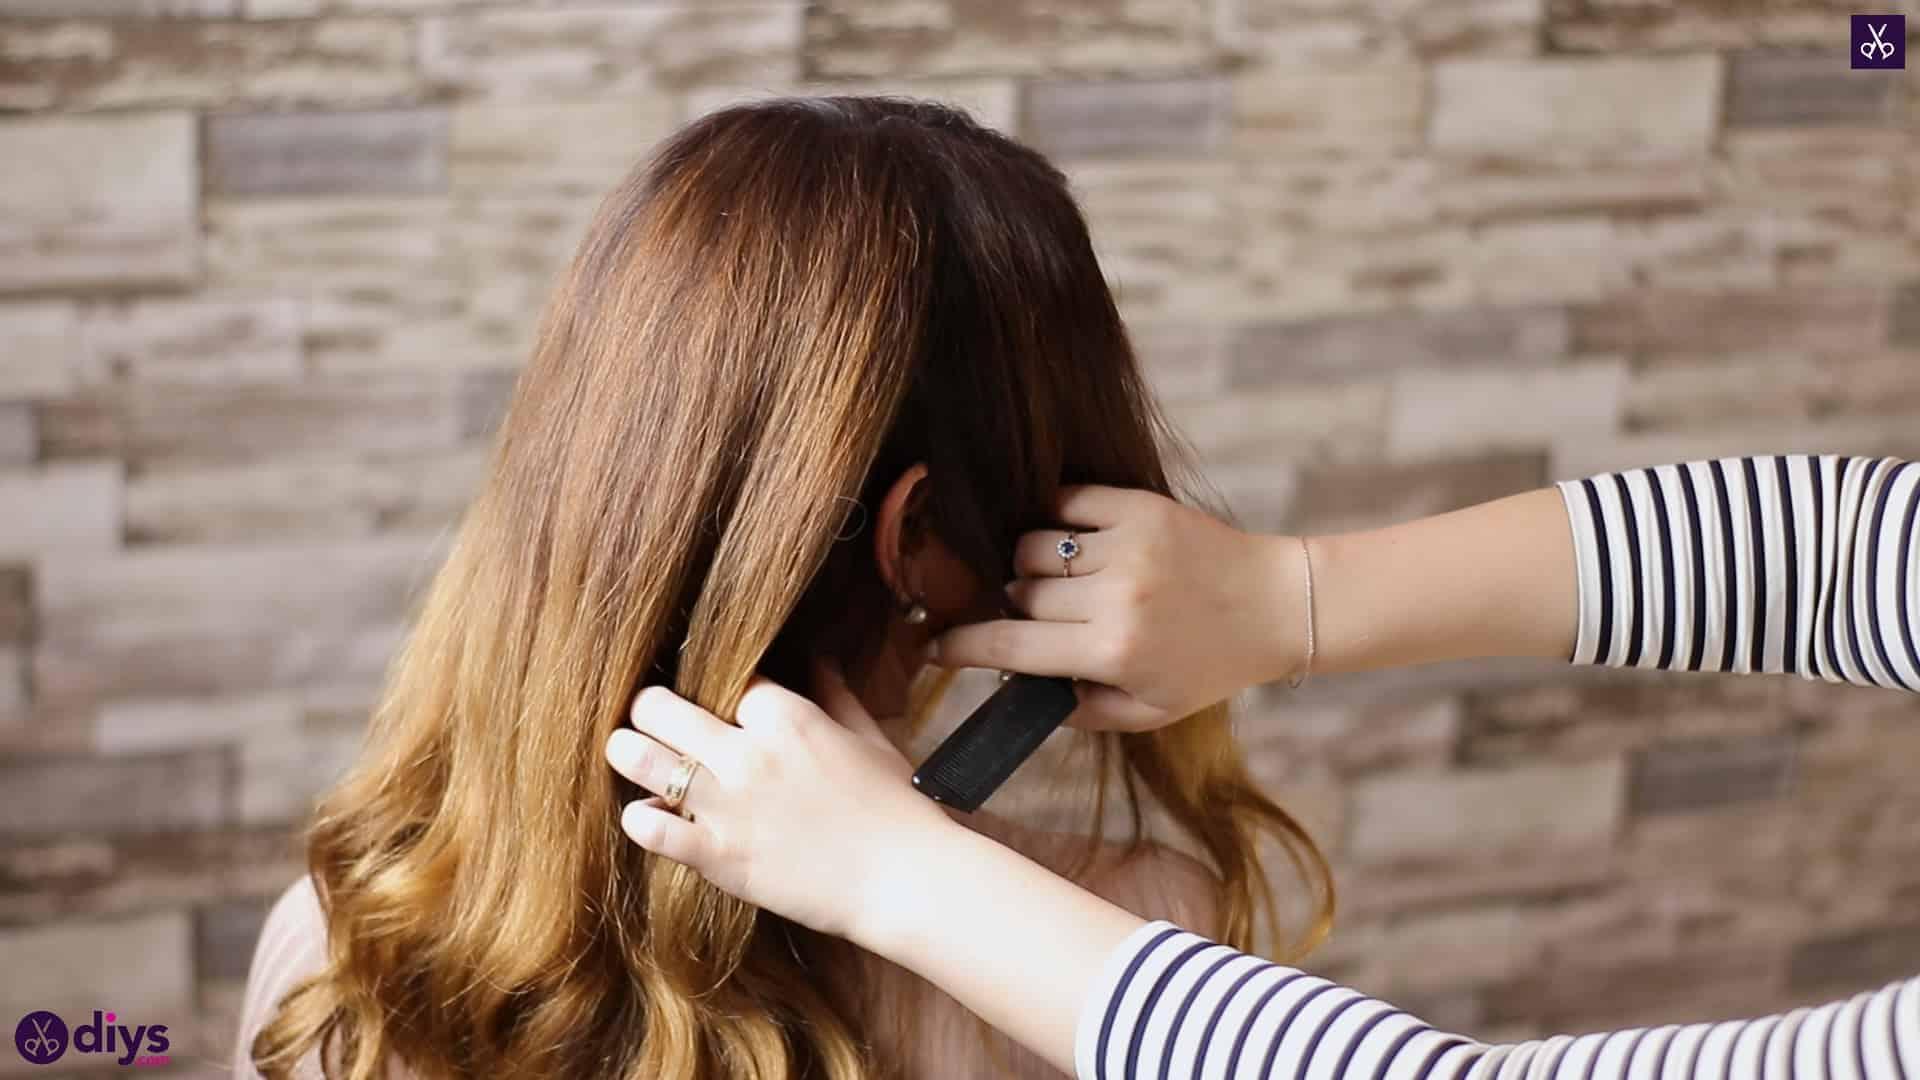 3 easy ponytails for everyday wear wraparound pony 1c